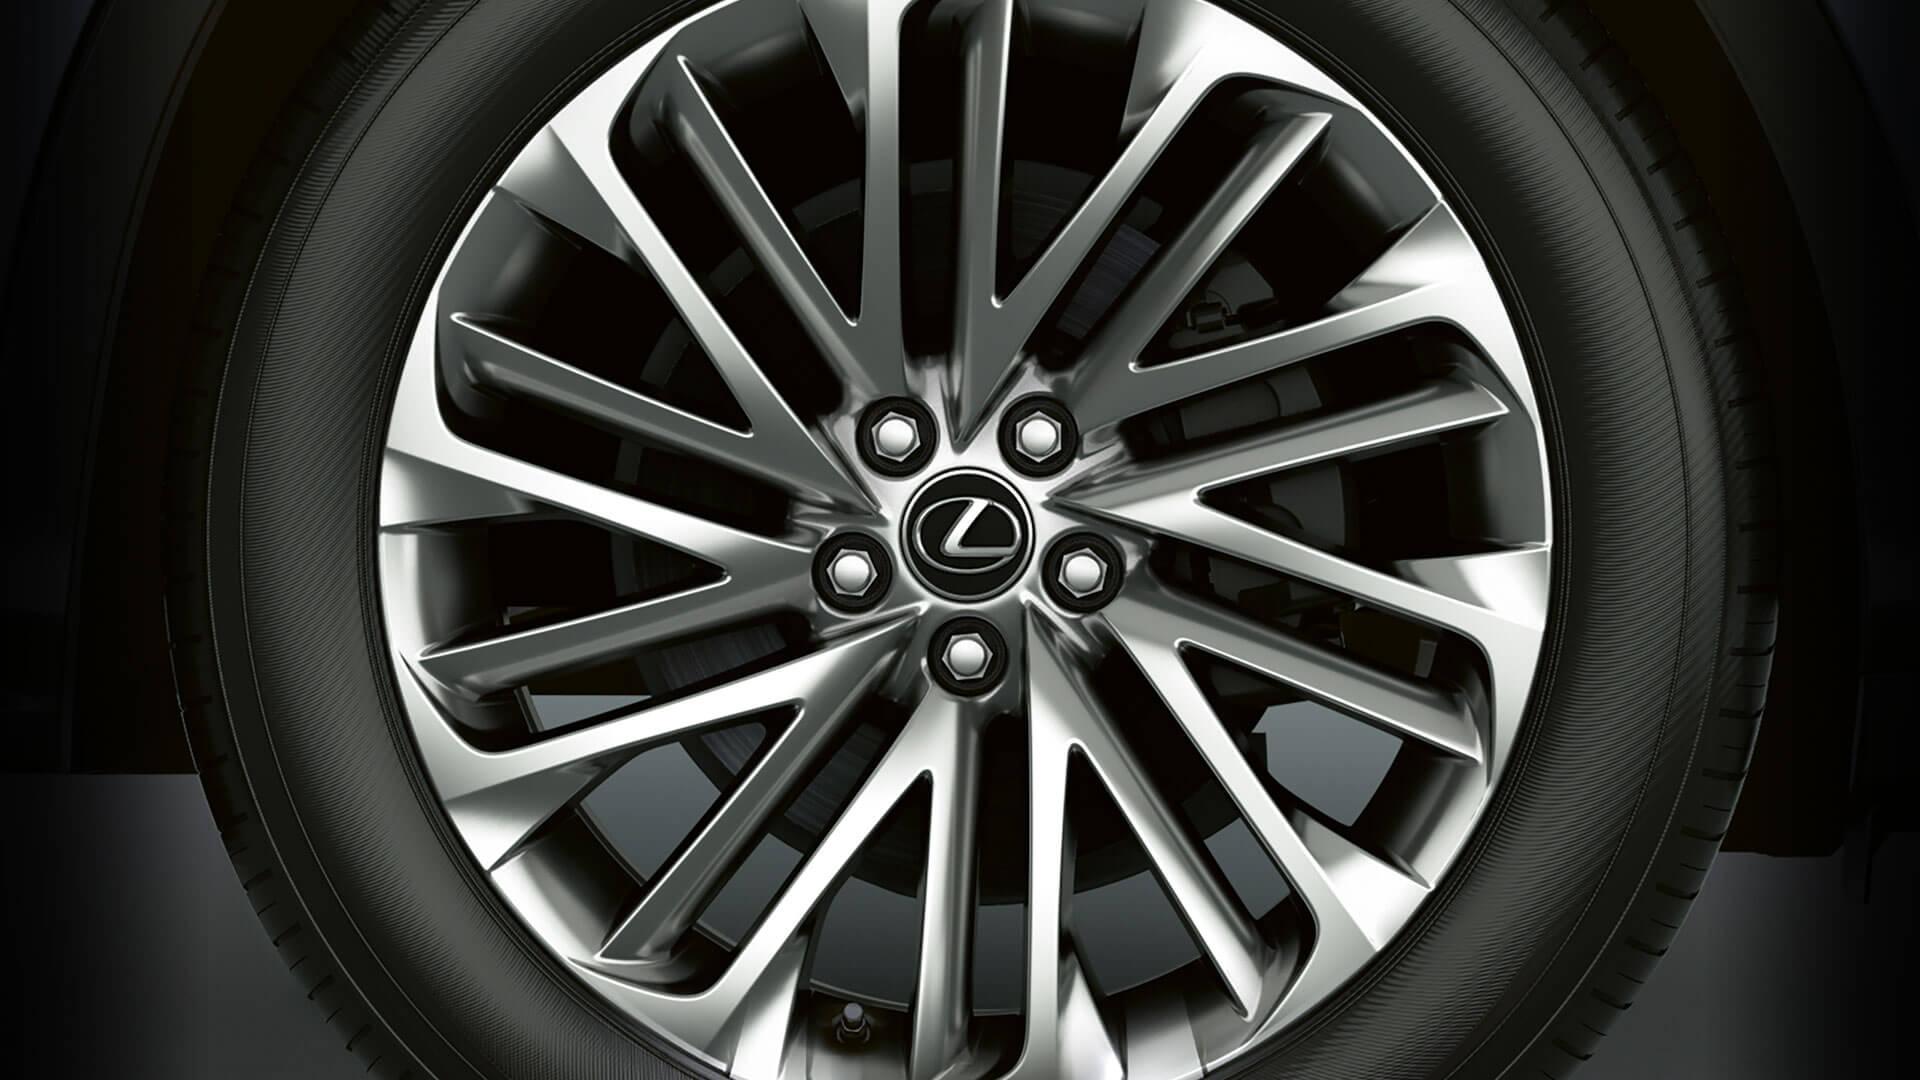 2019 lexus rx hotspot exterior 20 inch alloy wheels